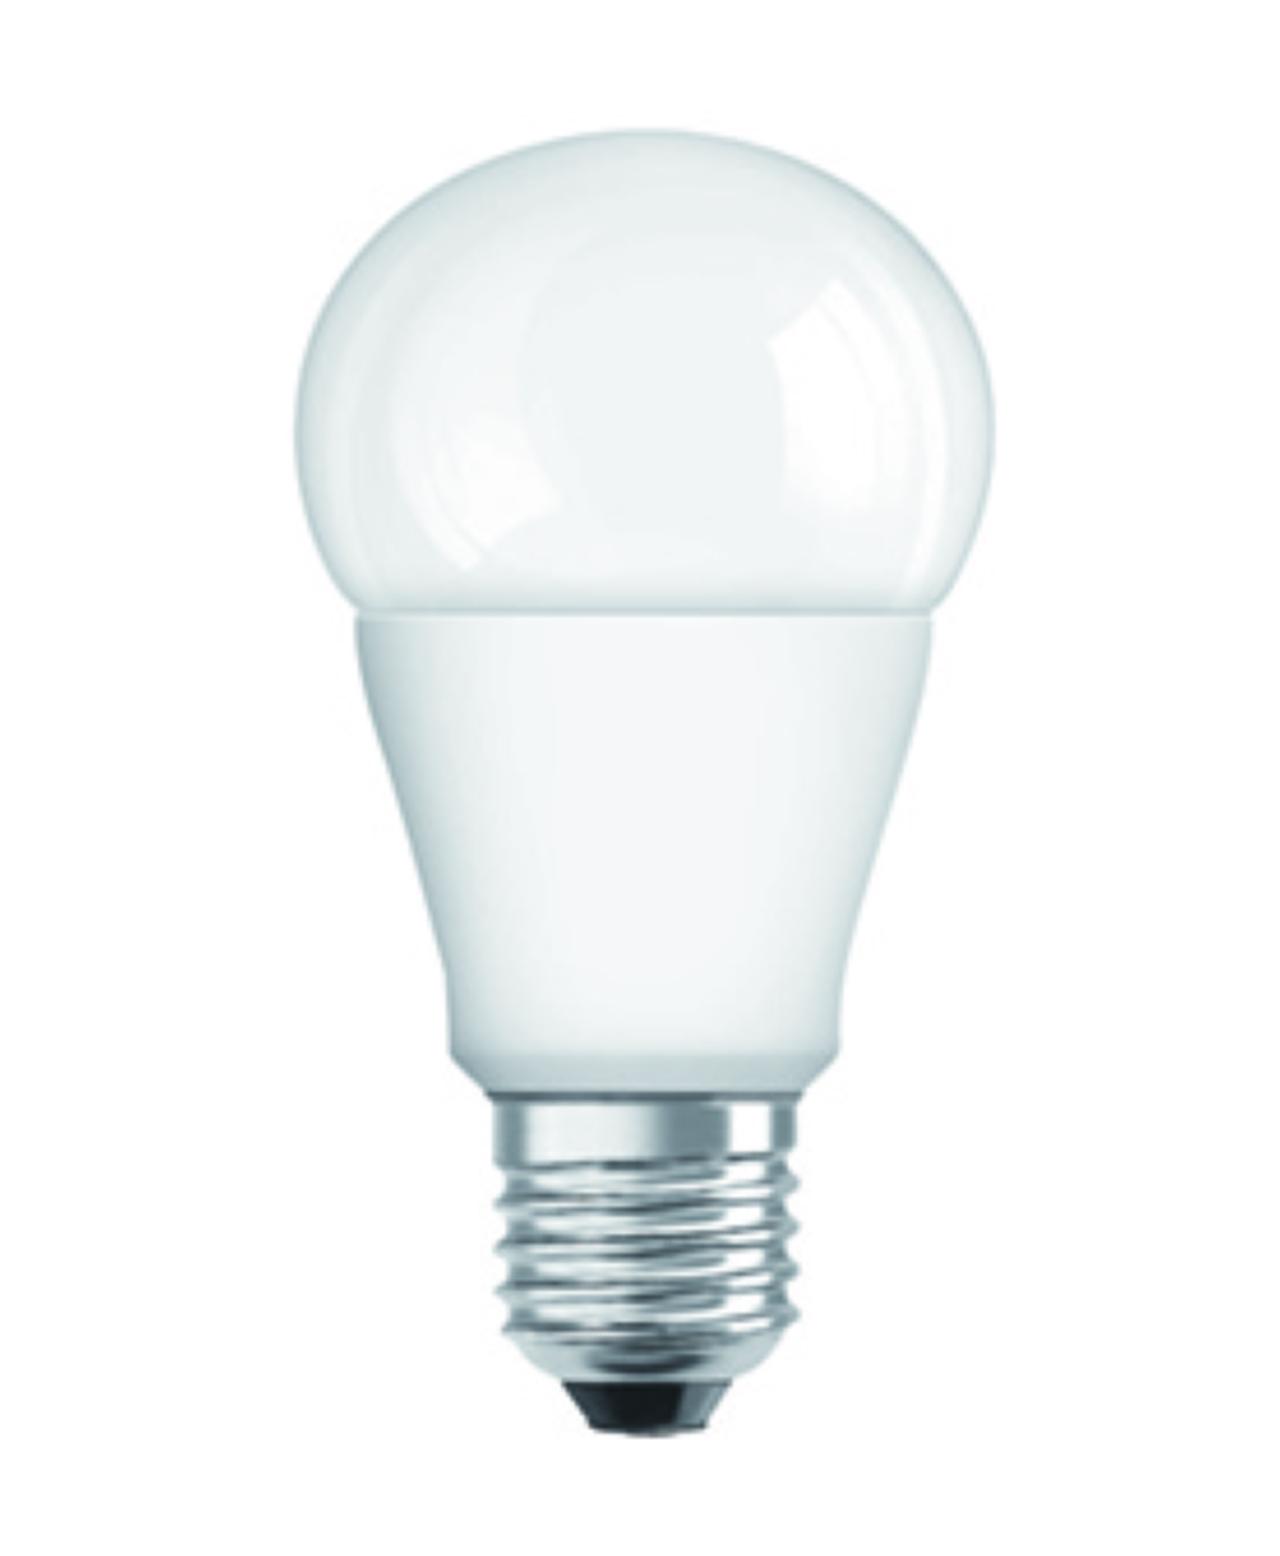 ampoule led osram parathom classic e27 6w 2700k a55 230v. Black Bedroom Furniture Sets. Home Design Ideas